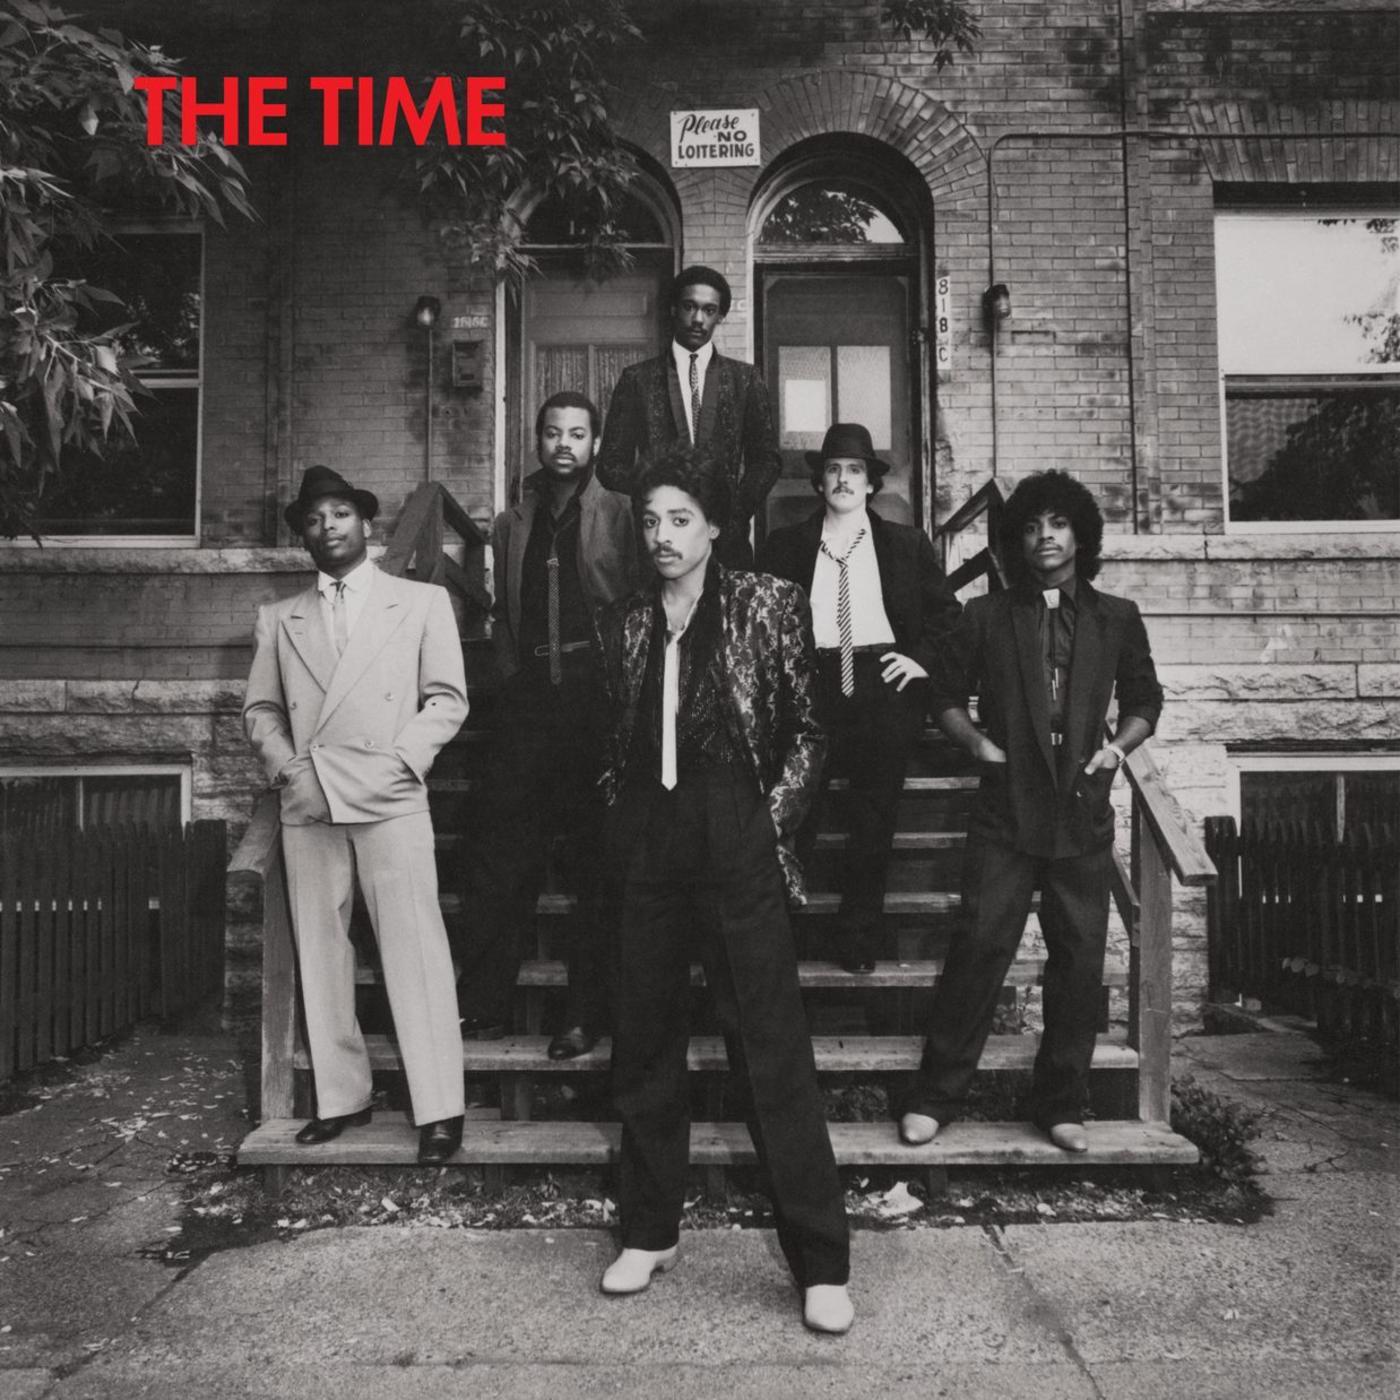 The Time, Warner Bros., 1981